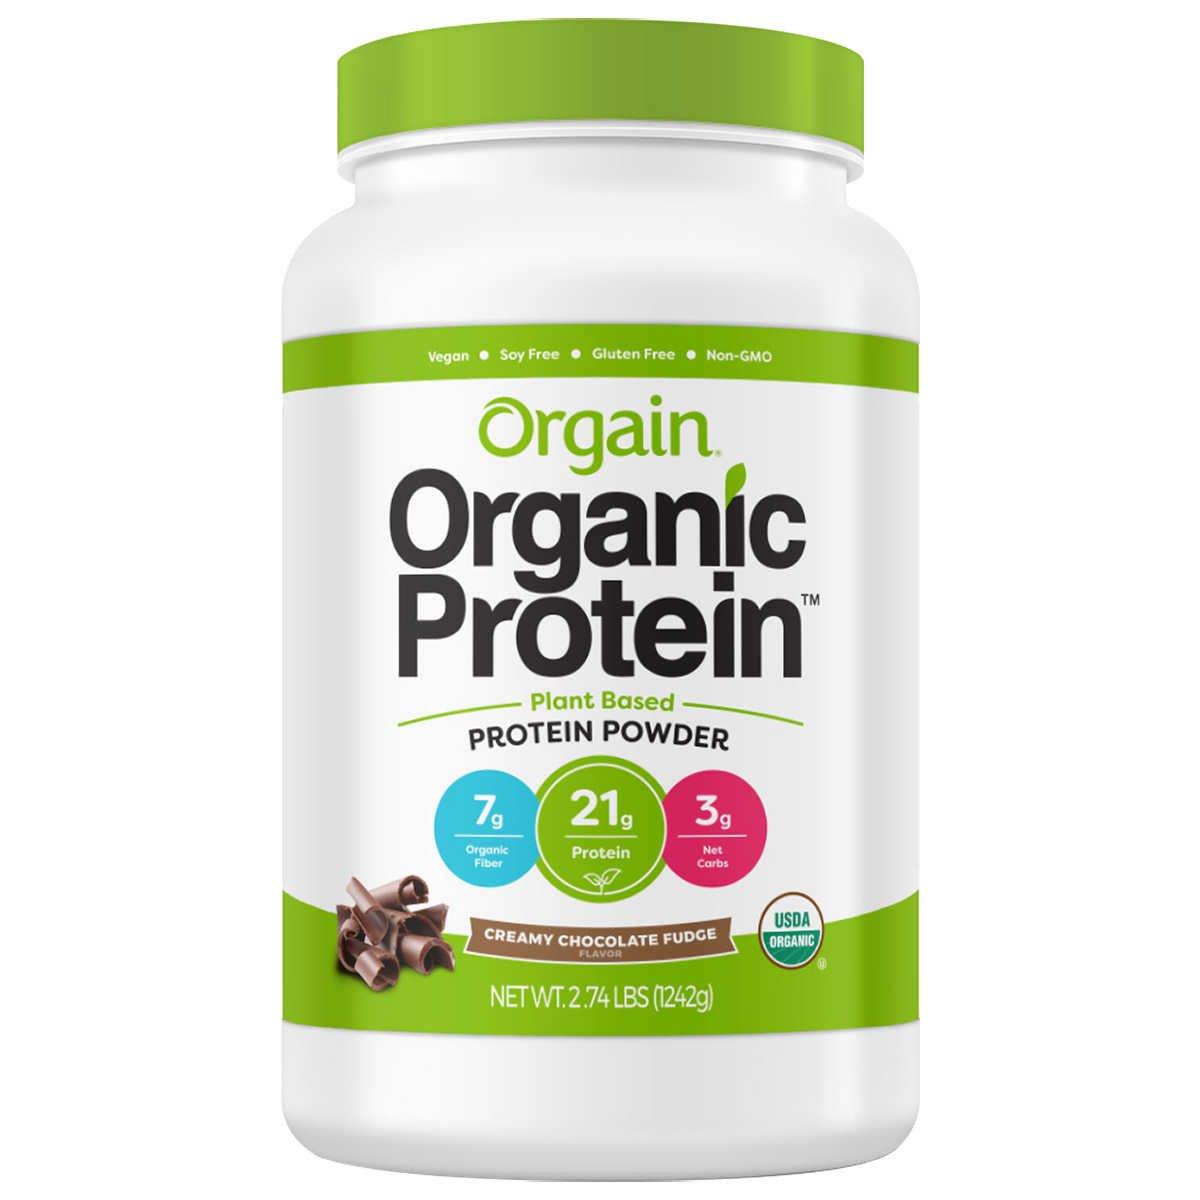 Orgain Organic Plant Based Protein Powder, Packaging May Vary (Creamy Chocolate Fudge, 2.74lb Tub)